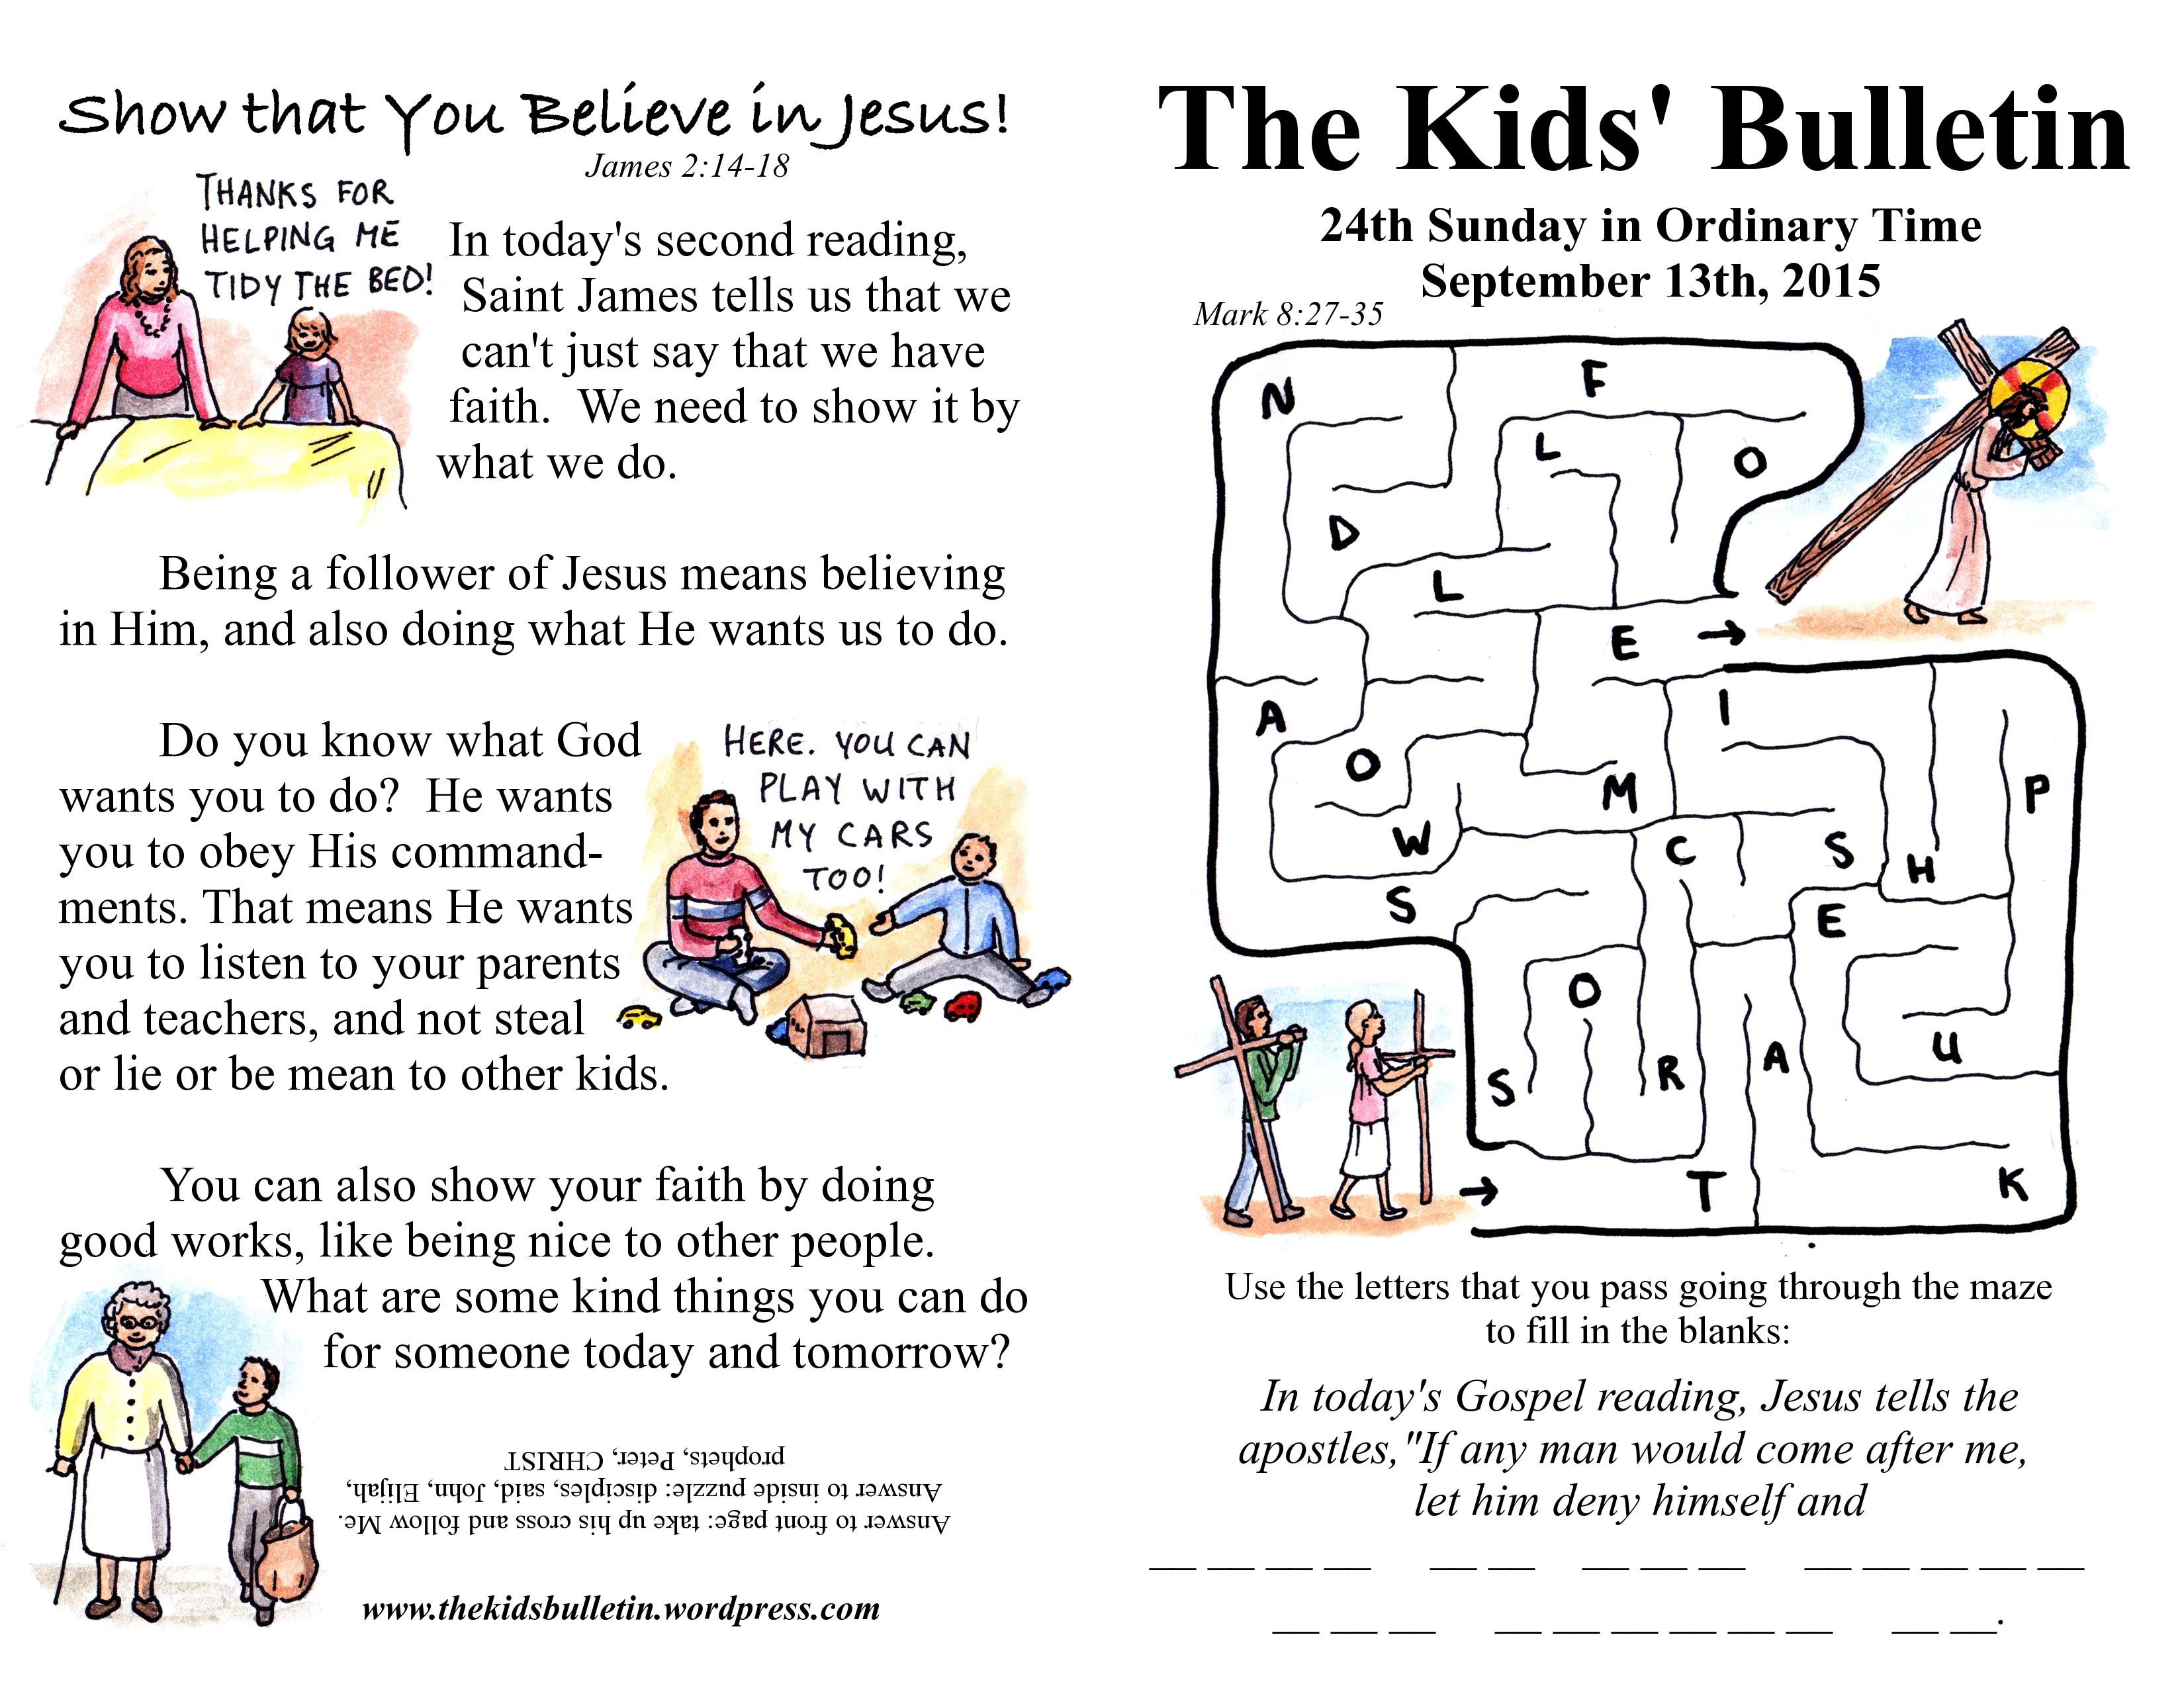 The Kids Bulletin 24th Sunday